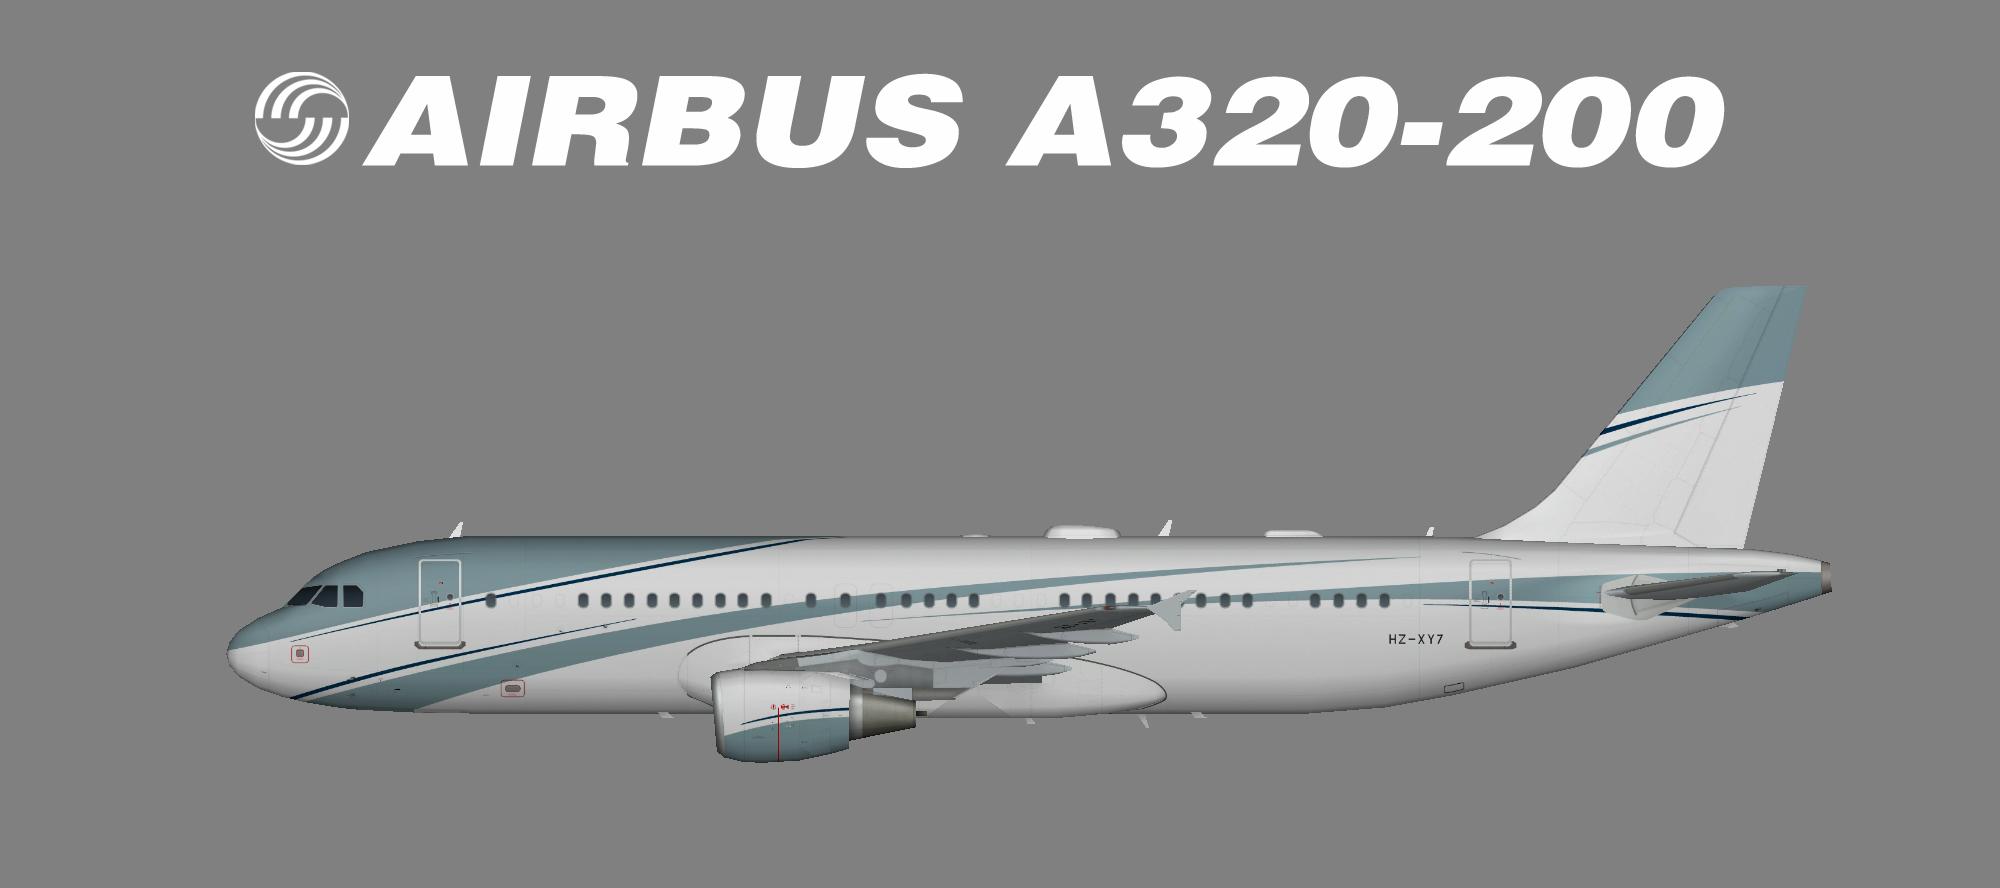 Aviation Link Company A320 HZ-XY7